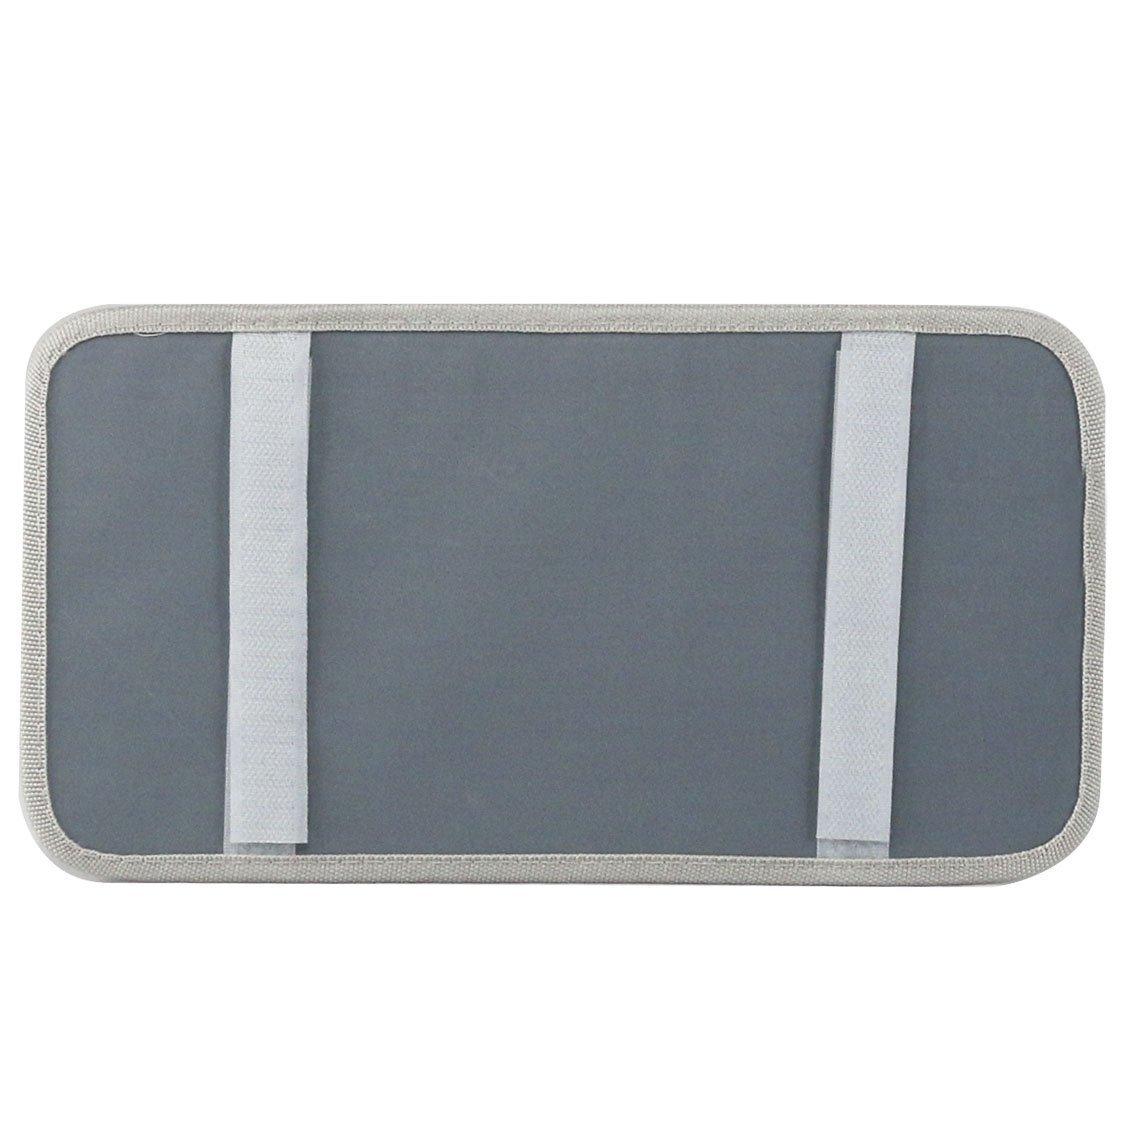 3 Credit Cards Pockets StyleZ CD Sun Visor Organizer Detachable Portable PU Leather with 8 CD Slots 5558976261 1 Pen Holder Gray 1 Sunglasses Holder